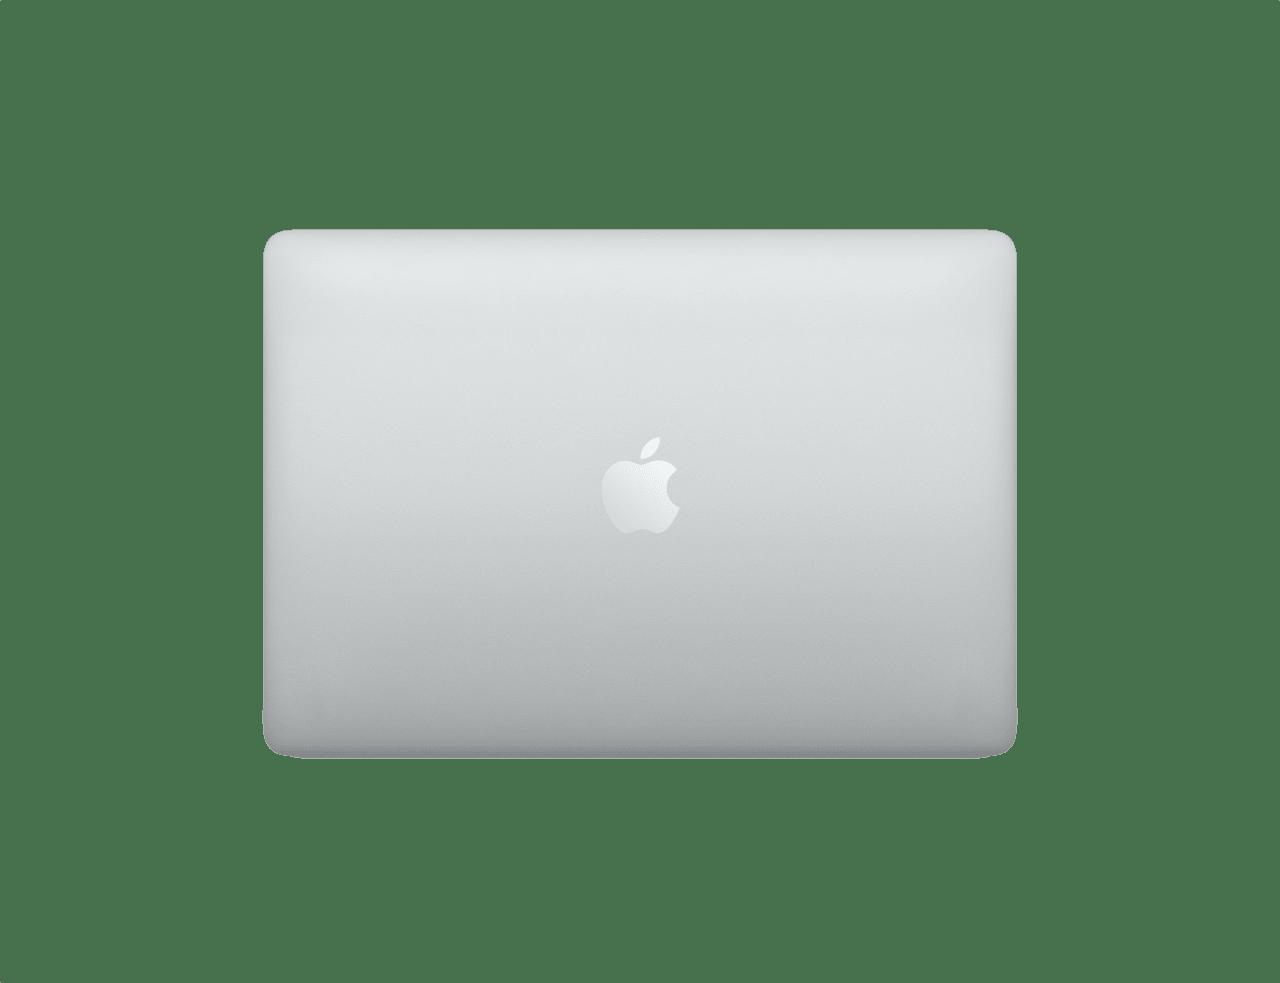 "Silber Apple 13"" MacBook Pro (Early 2020) Notebook - Intel® Core™ i5-1038NG7 - 16GB - 1TB SSD - Intel® Iris™ Plus Graphics.3"